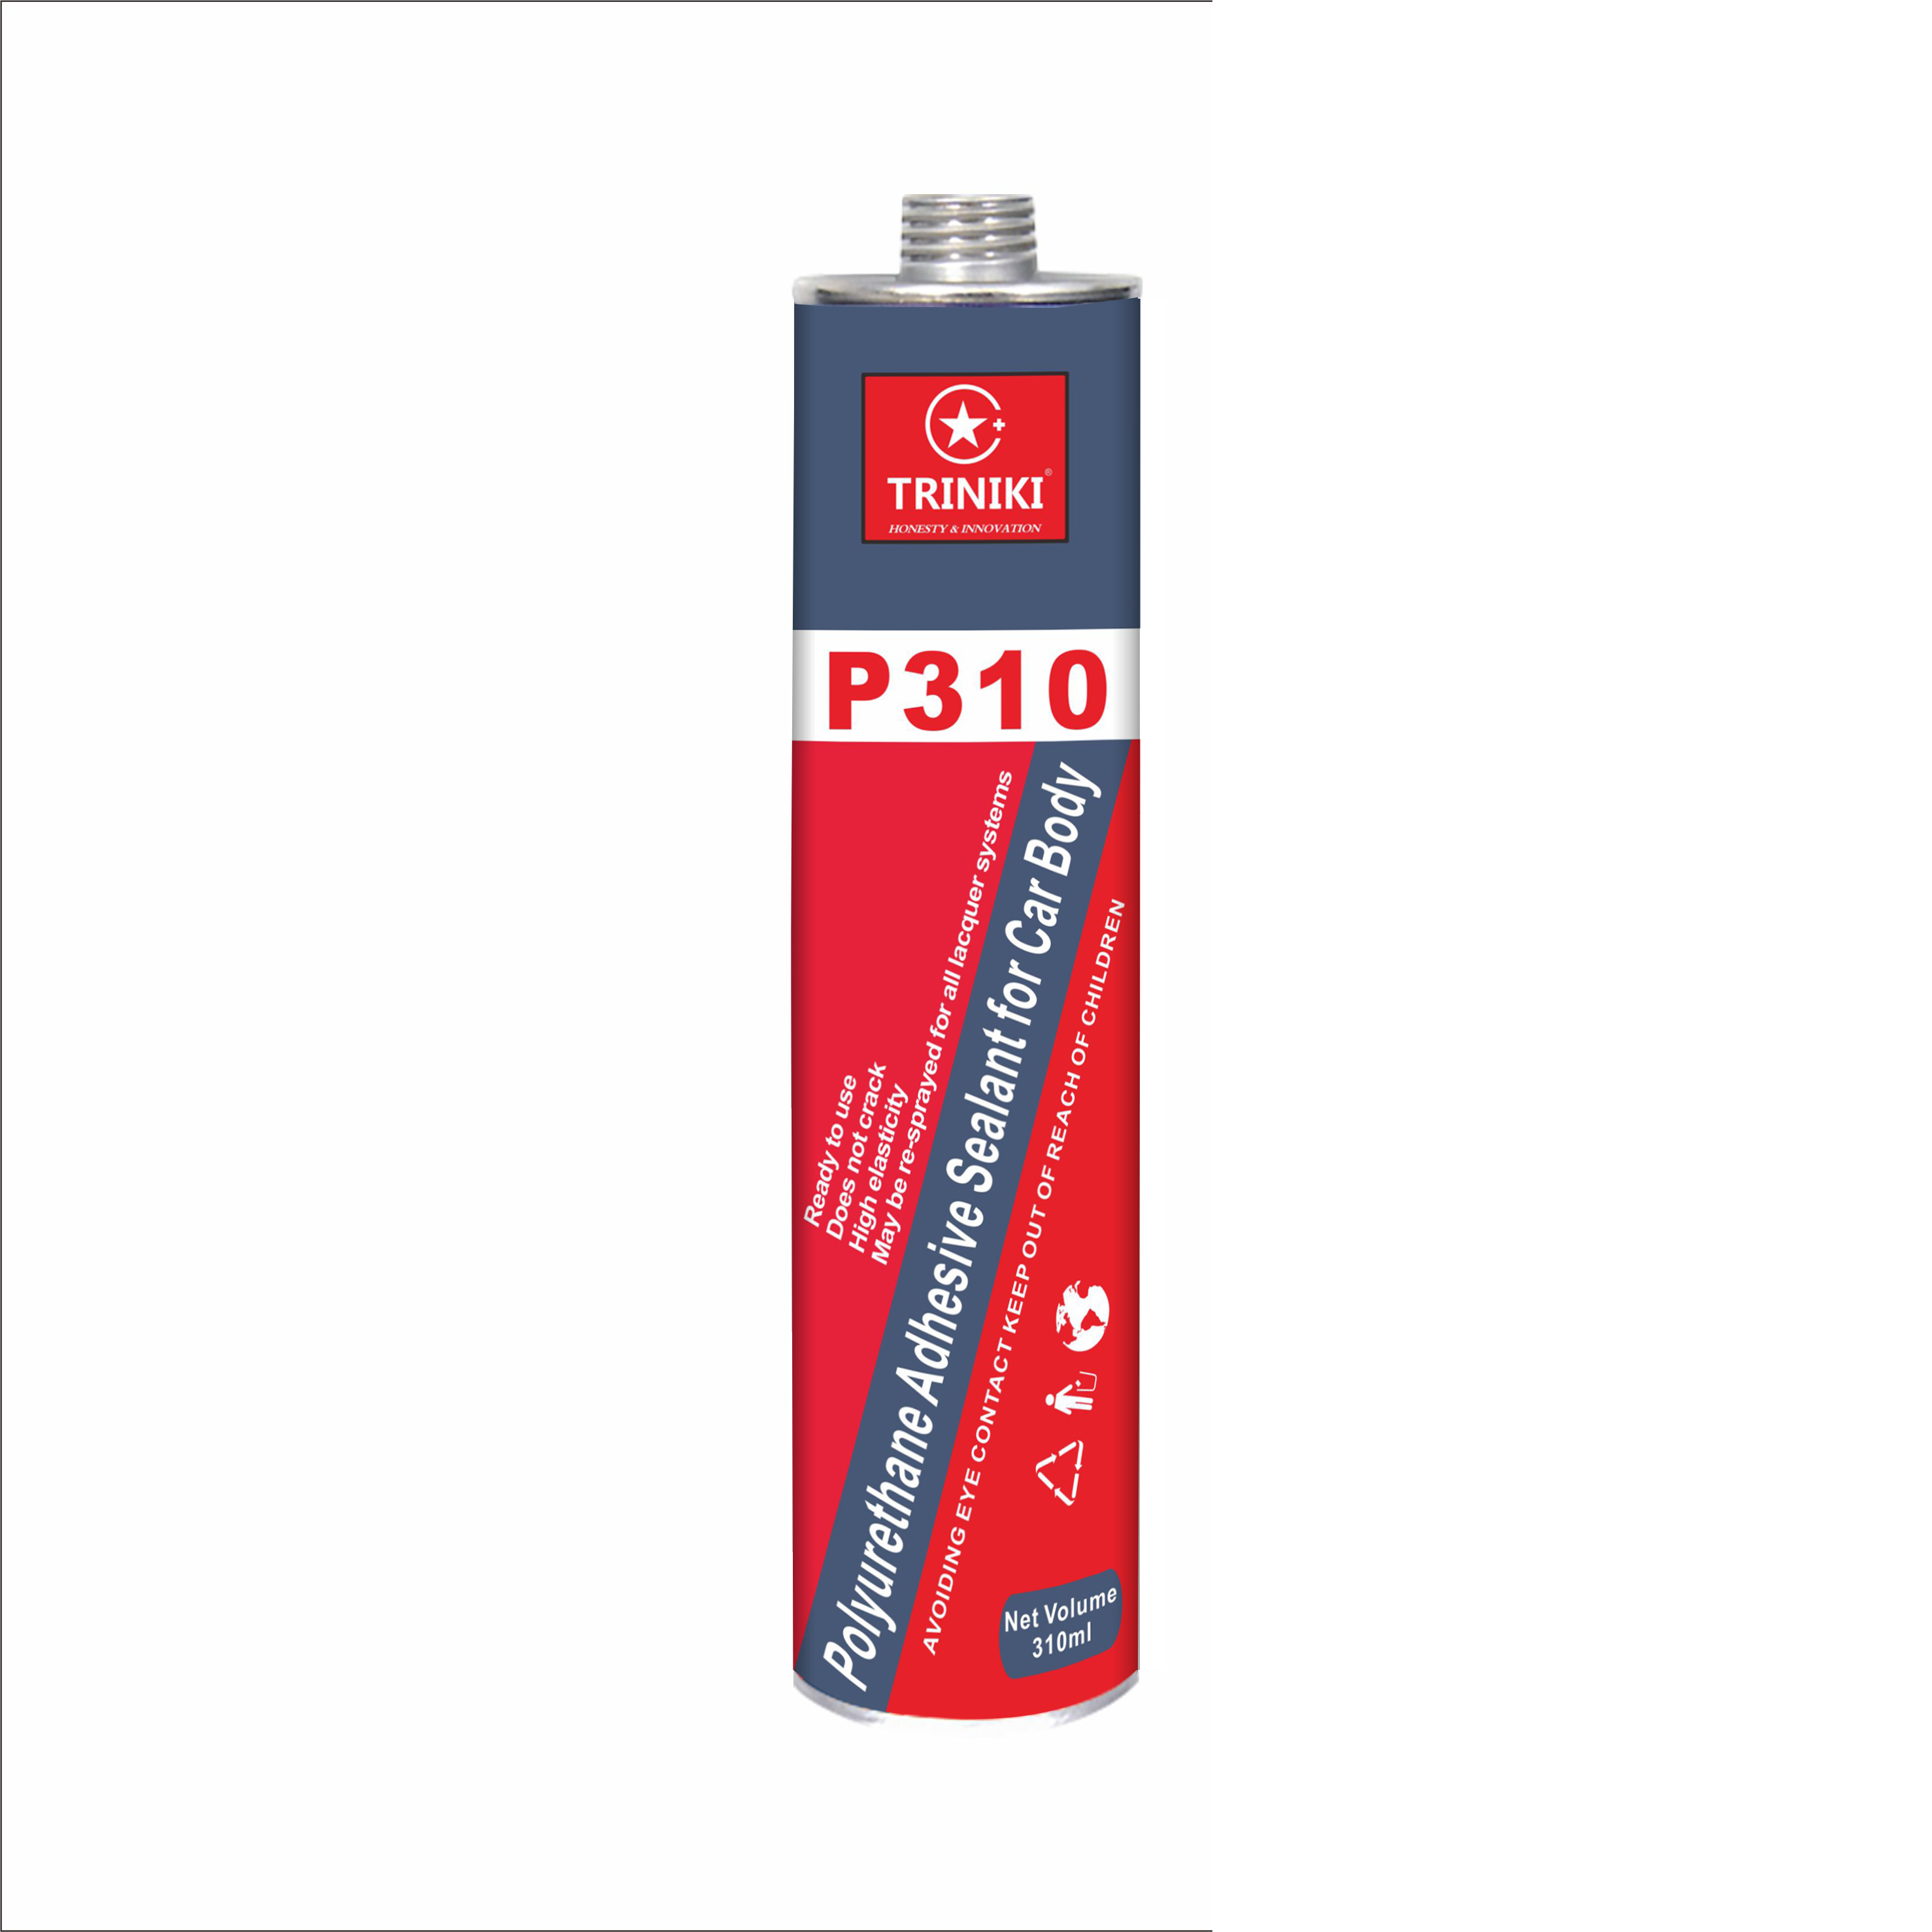 Polyurethane Adhesive Sealant for Car Body